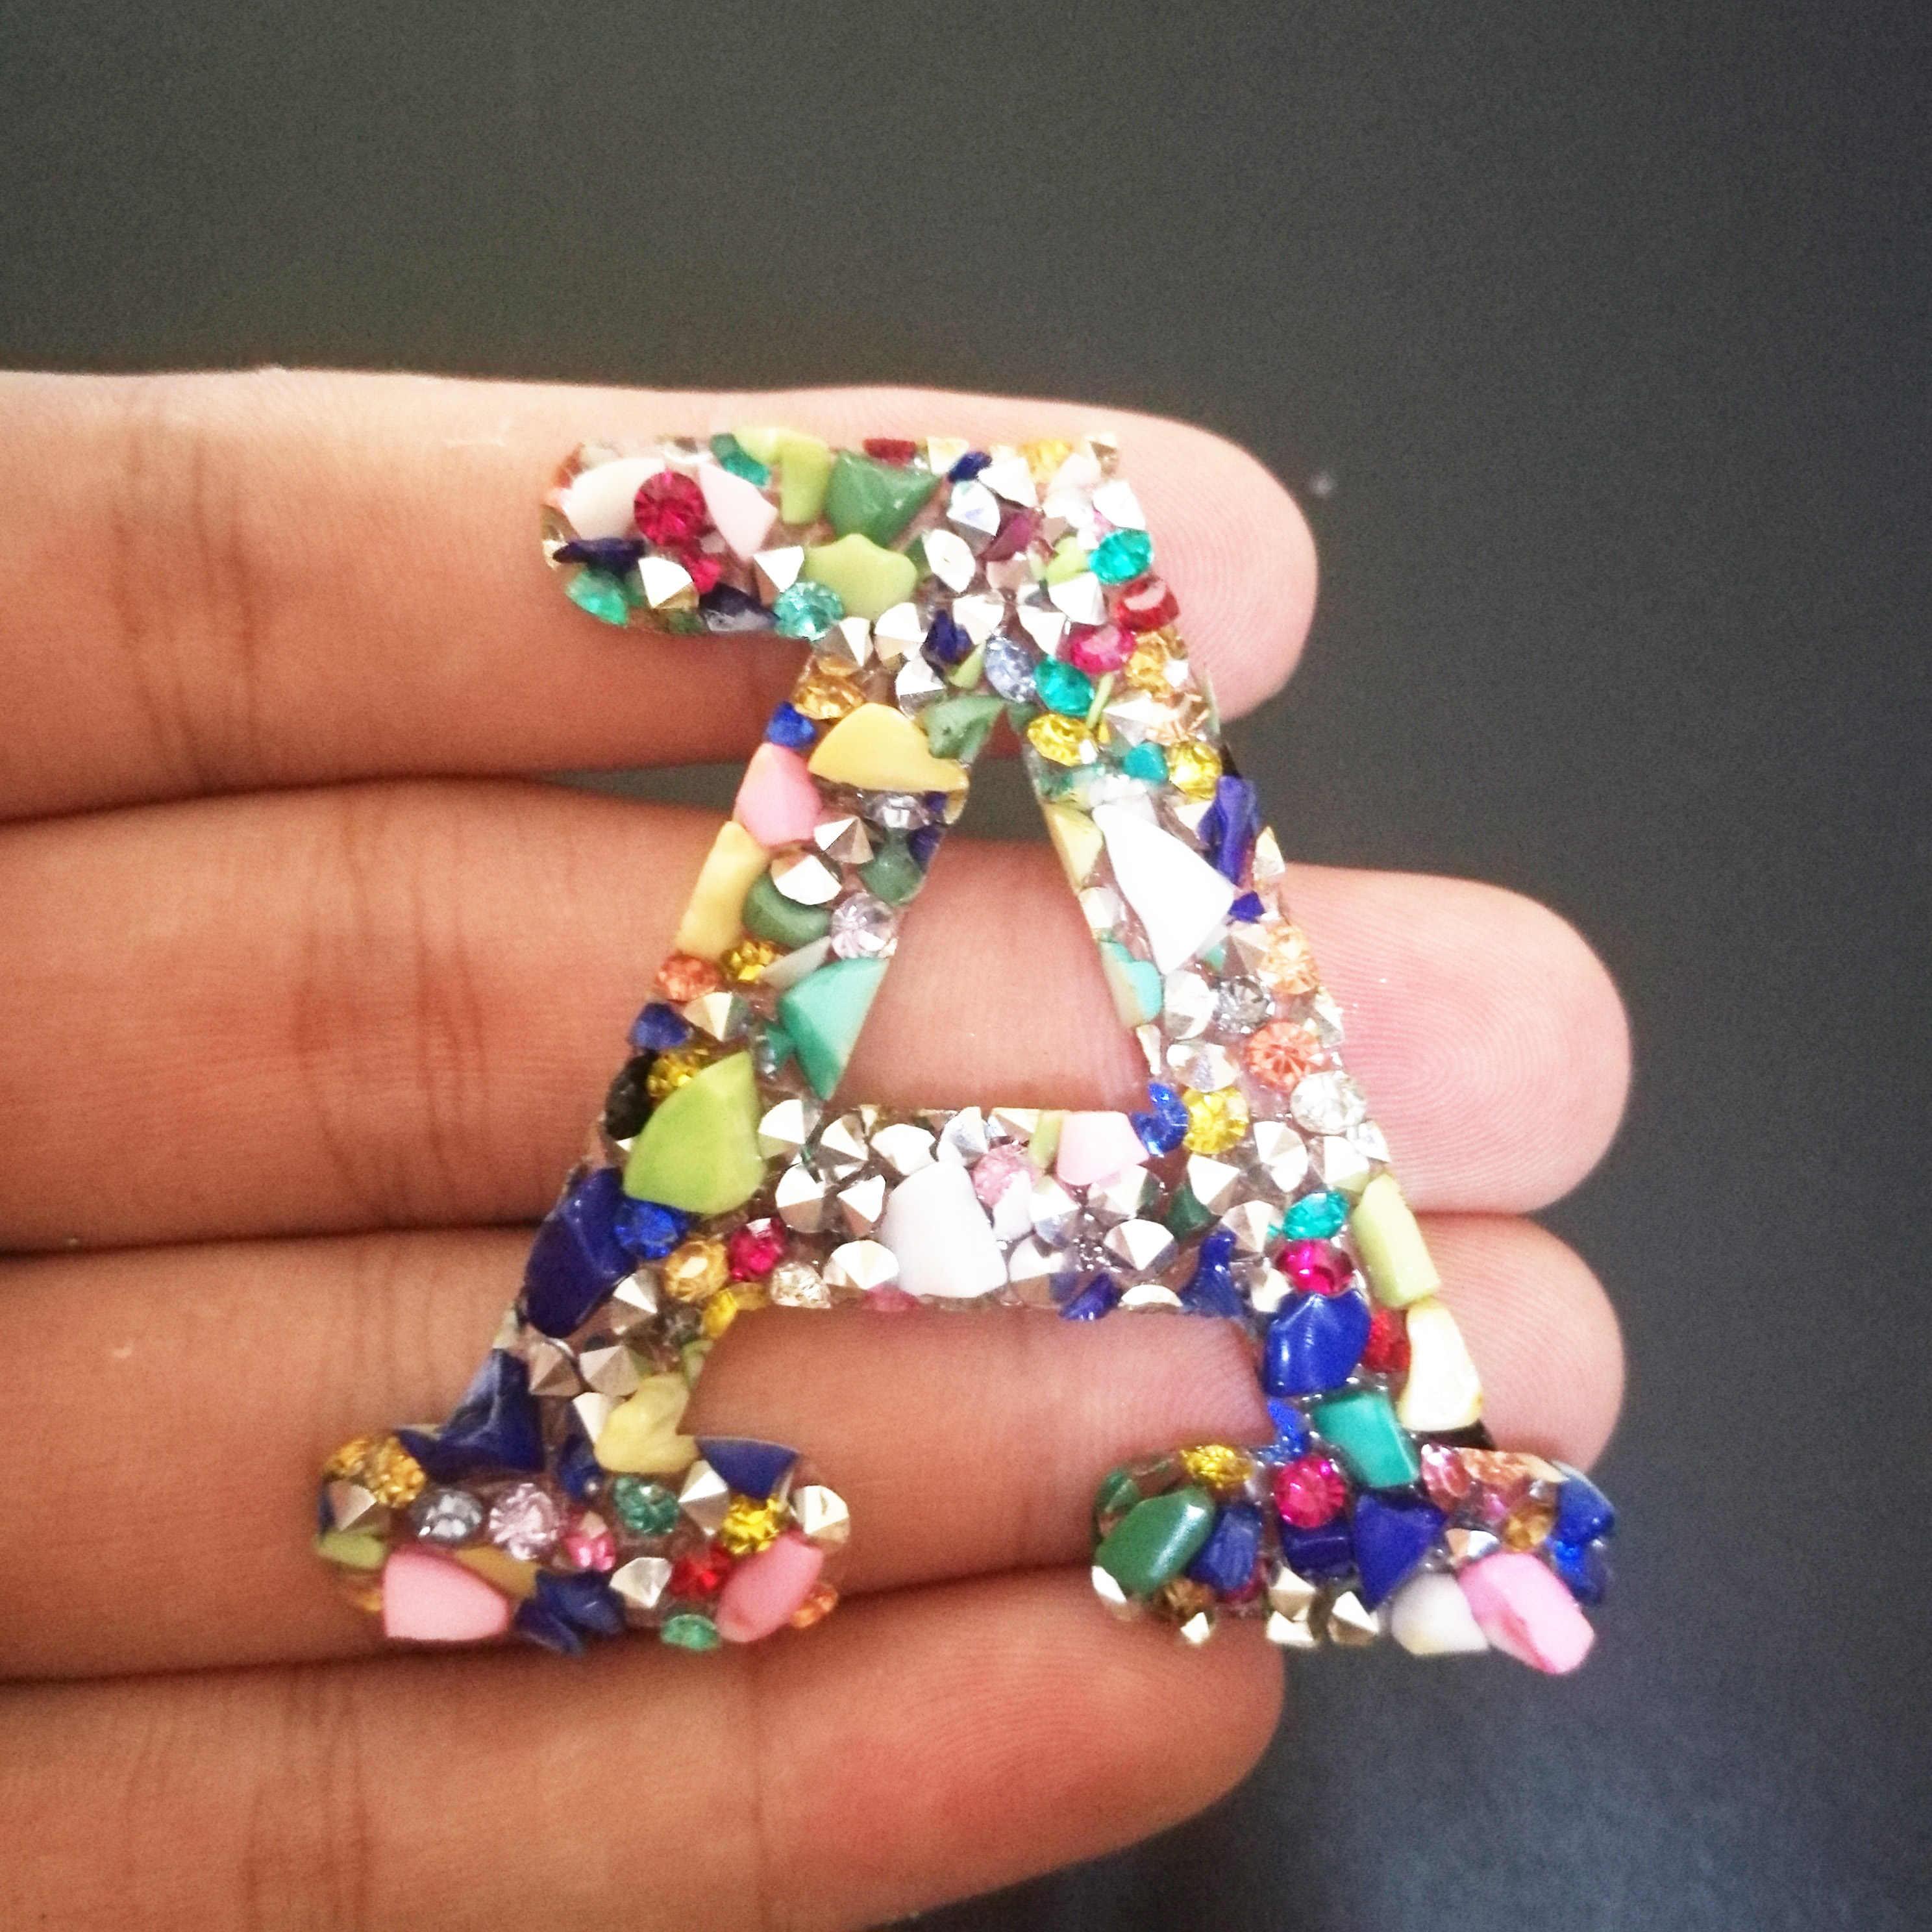 A-C 1 Pc Warna Batu Berlian Imitasi Huruf Besi Pada Patch untuk Pakaian Garis Pakaian Stiker Bordiran DIY Nama Logo Pekerjaan Tangan